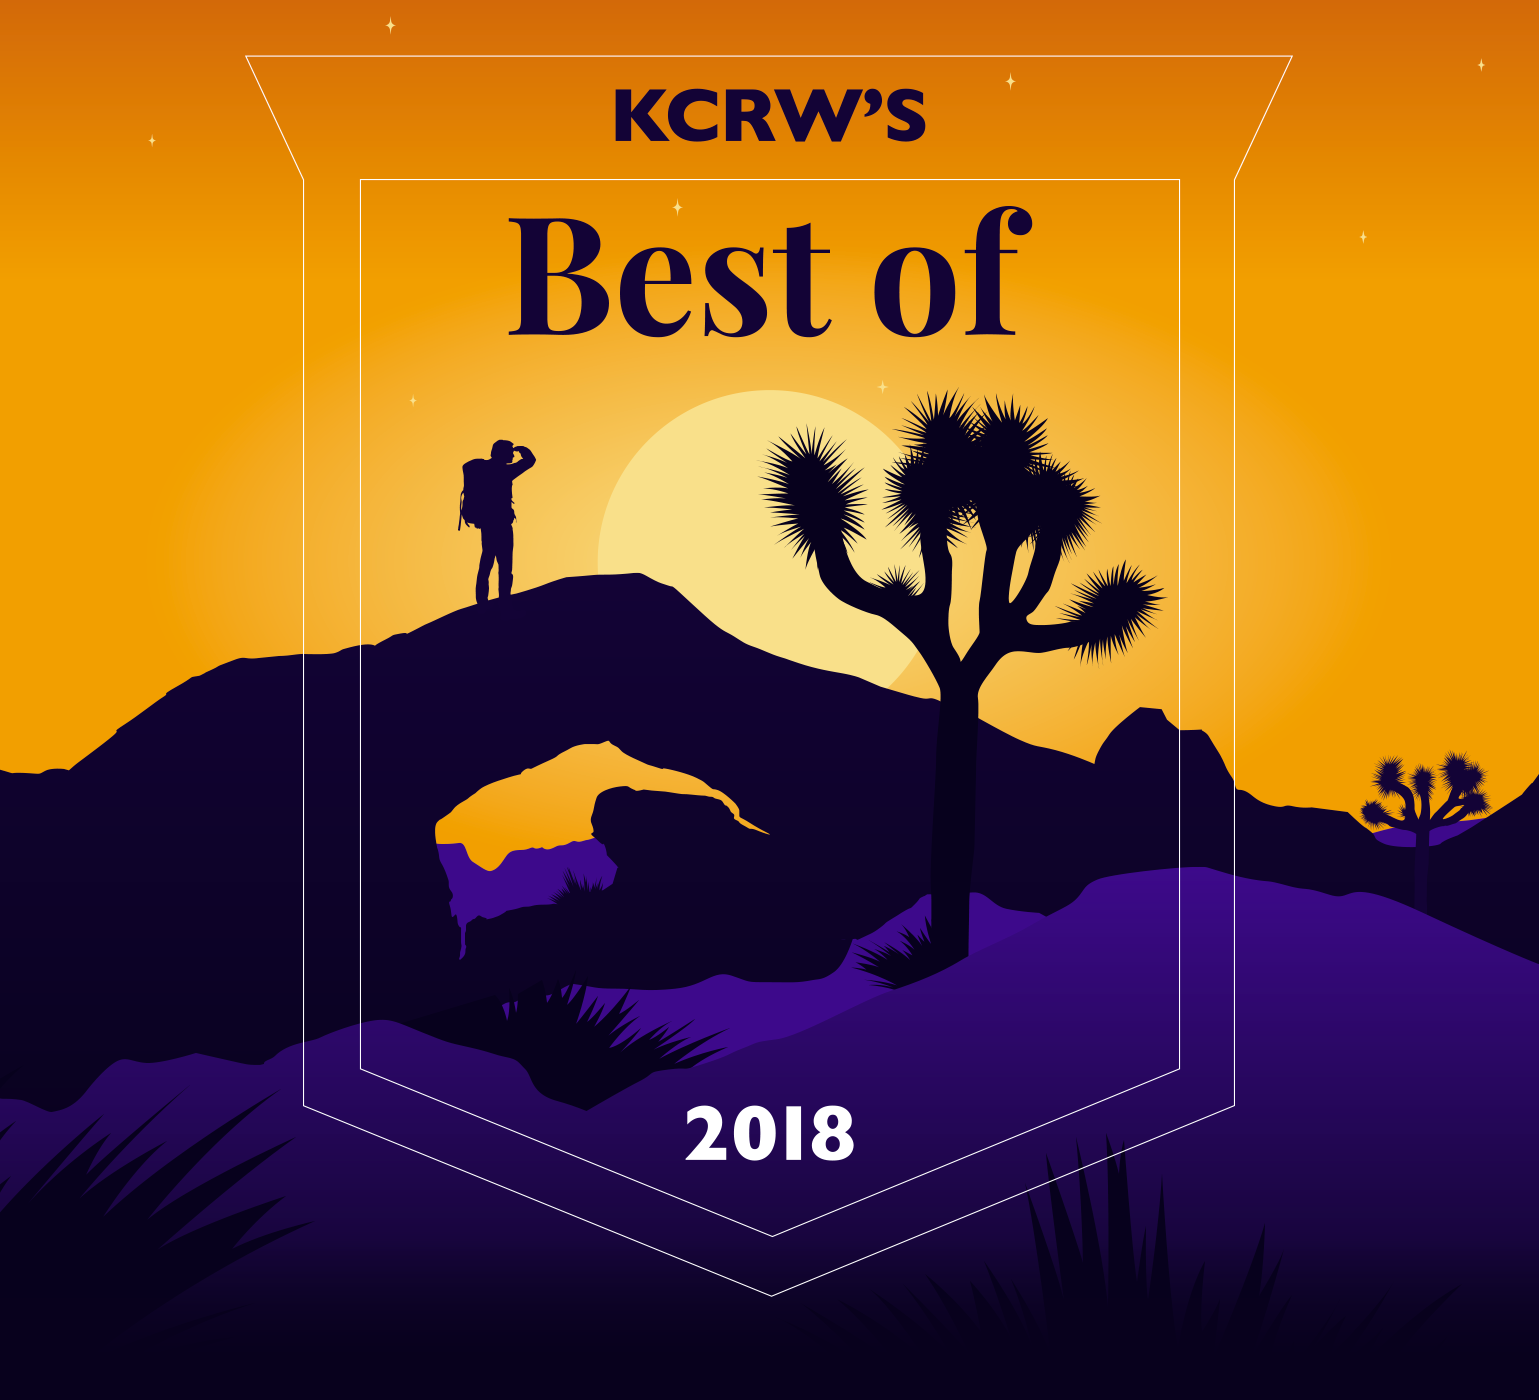 KCRW's Best of 2018